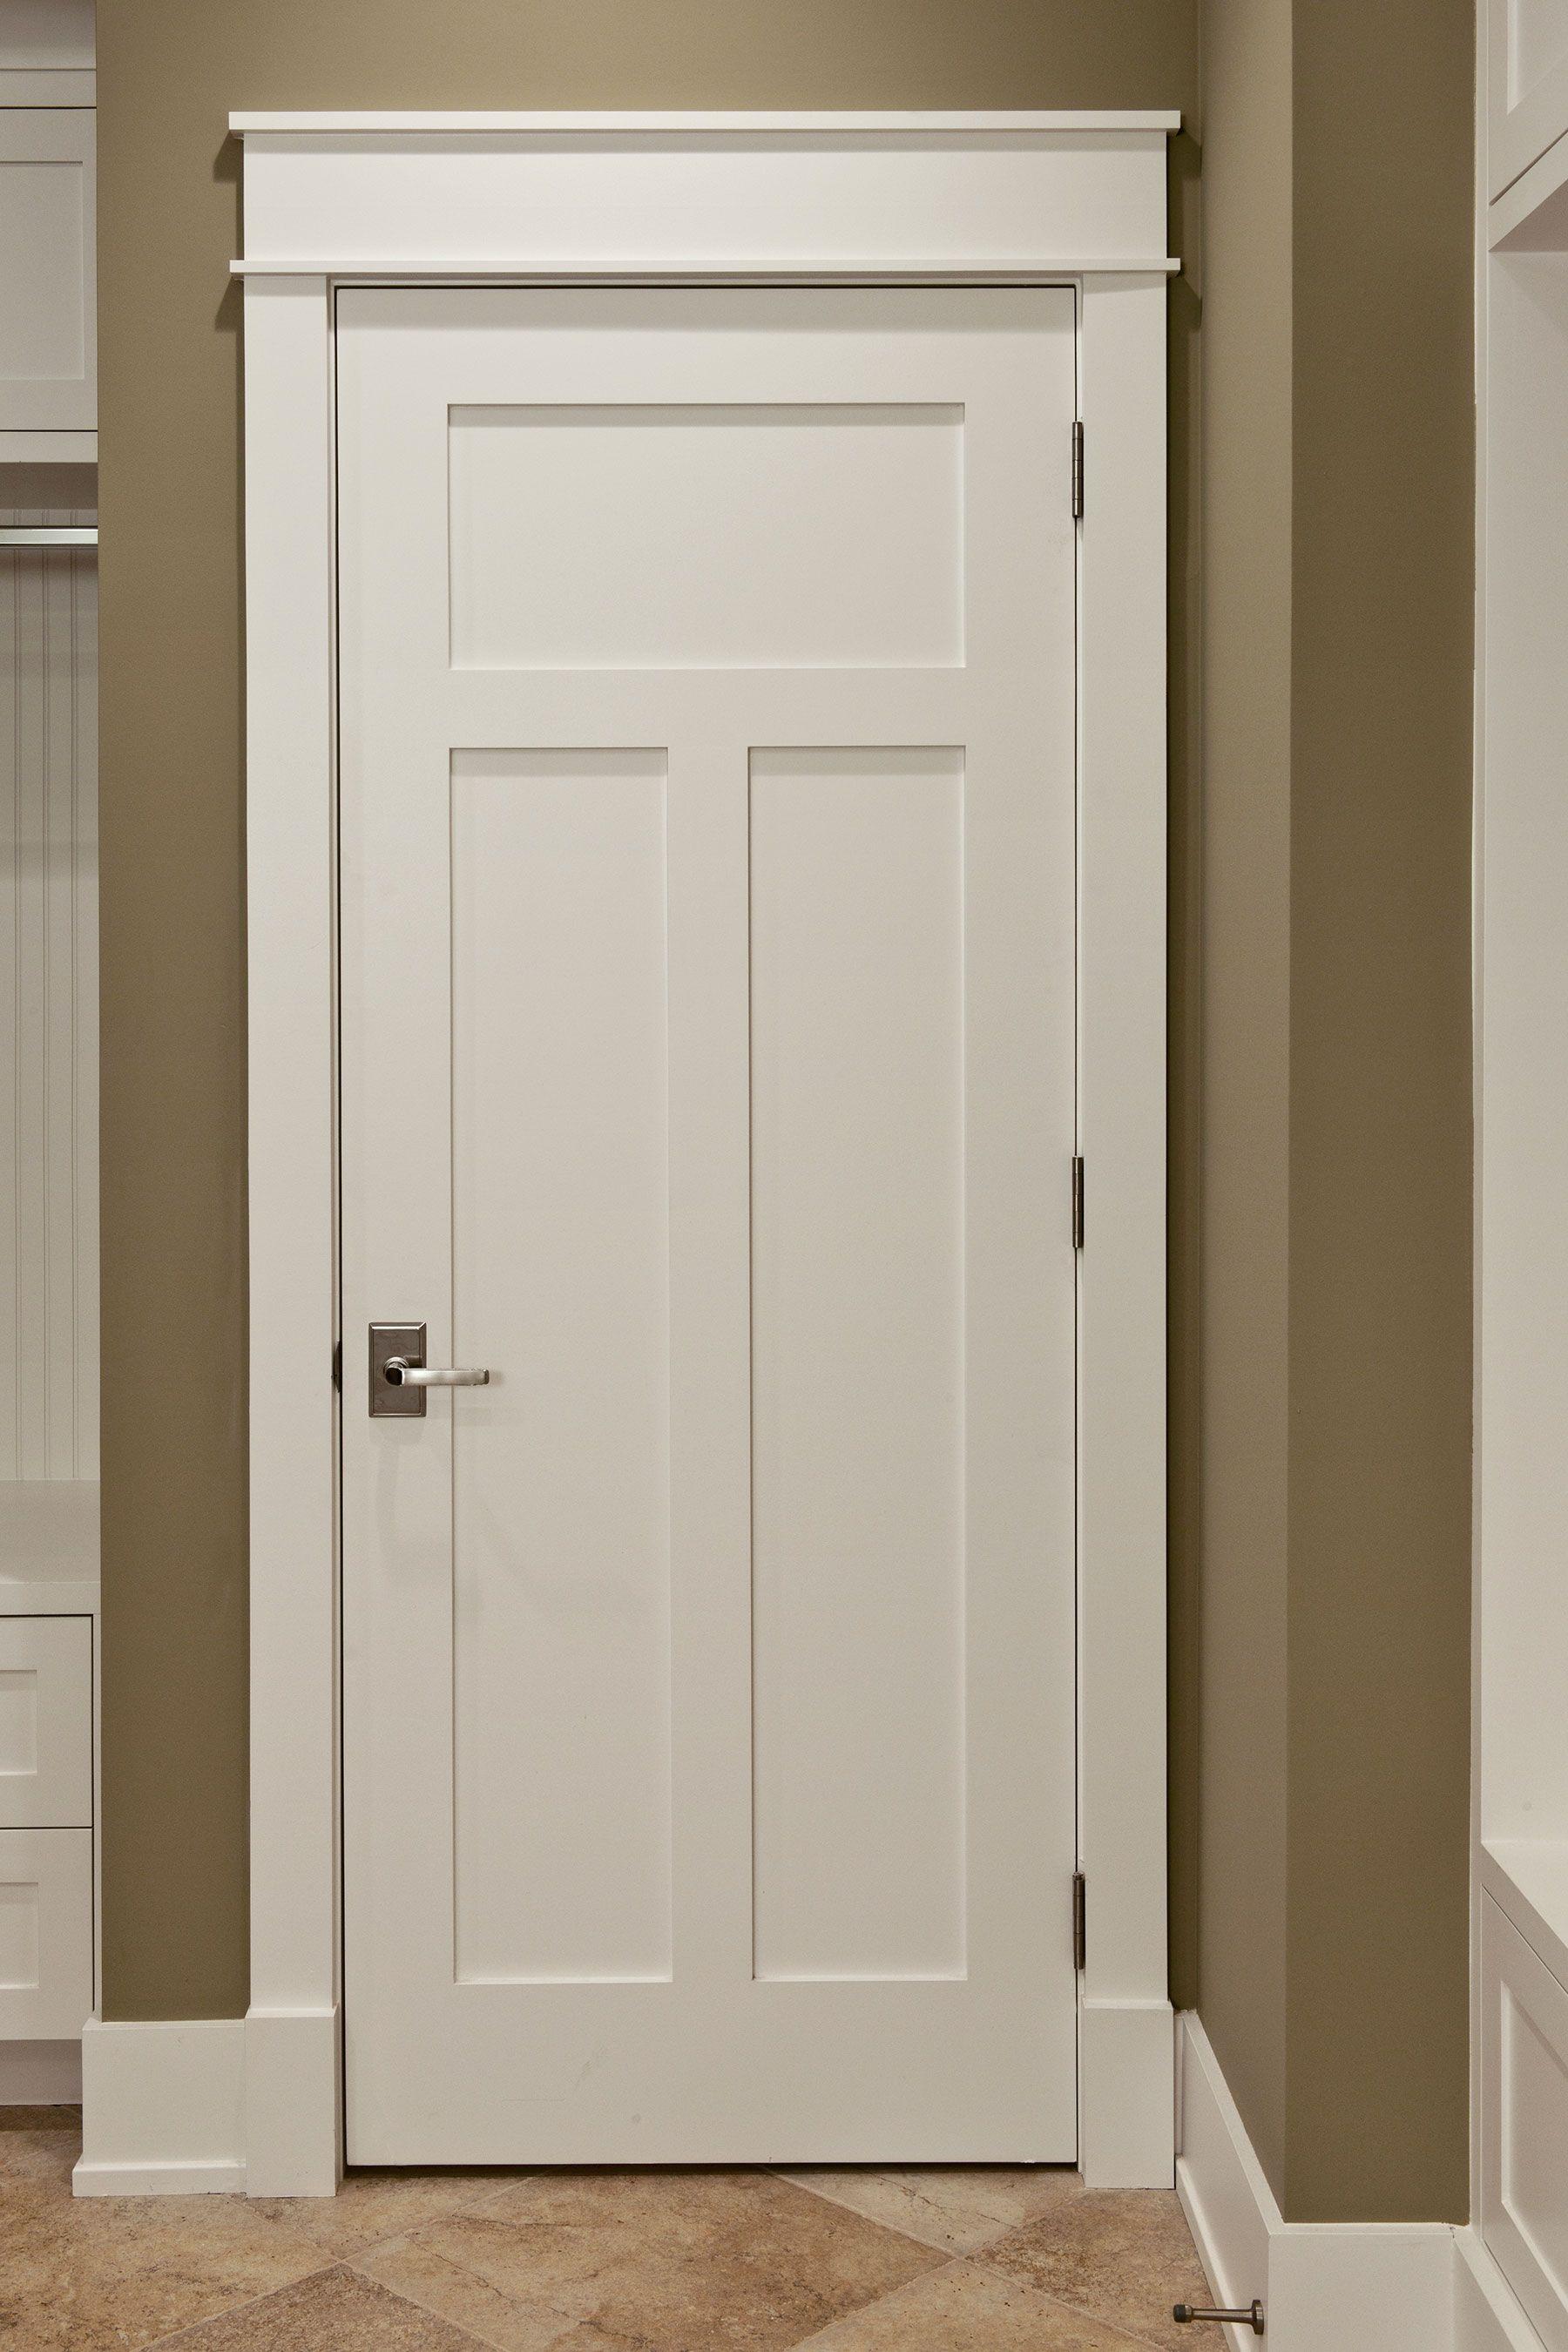 Custom Wood Interior Doors Craftsman Style Custom Interior Paint Grade Wood Door Craftsman Interior Doors Interior Door Styles Interior Window Trim